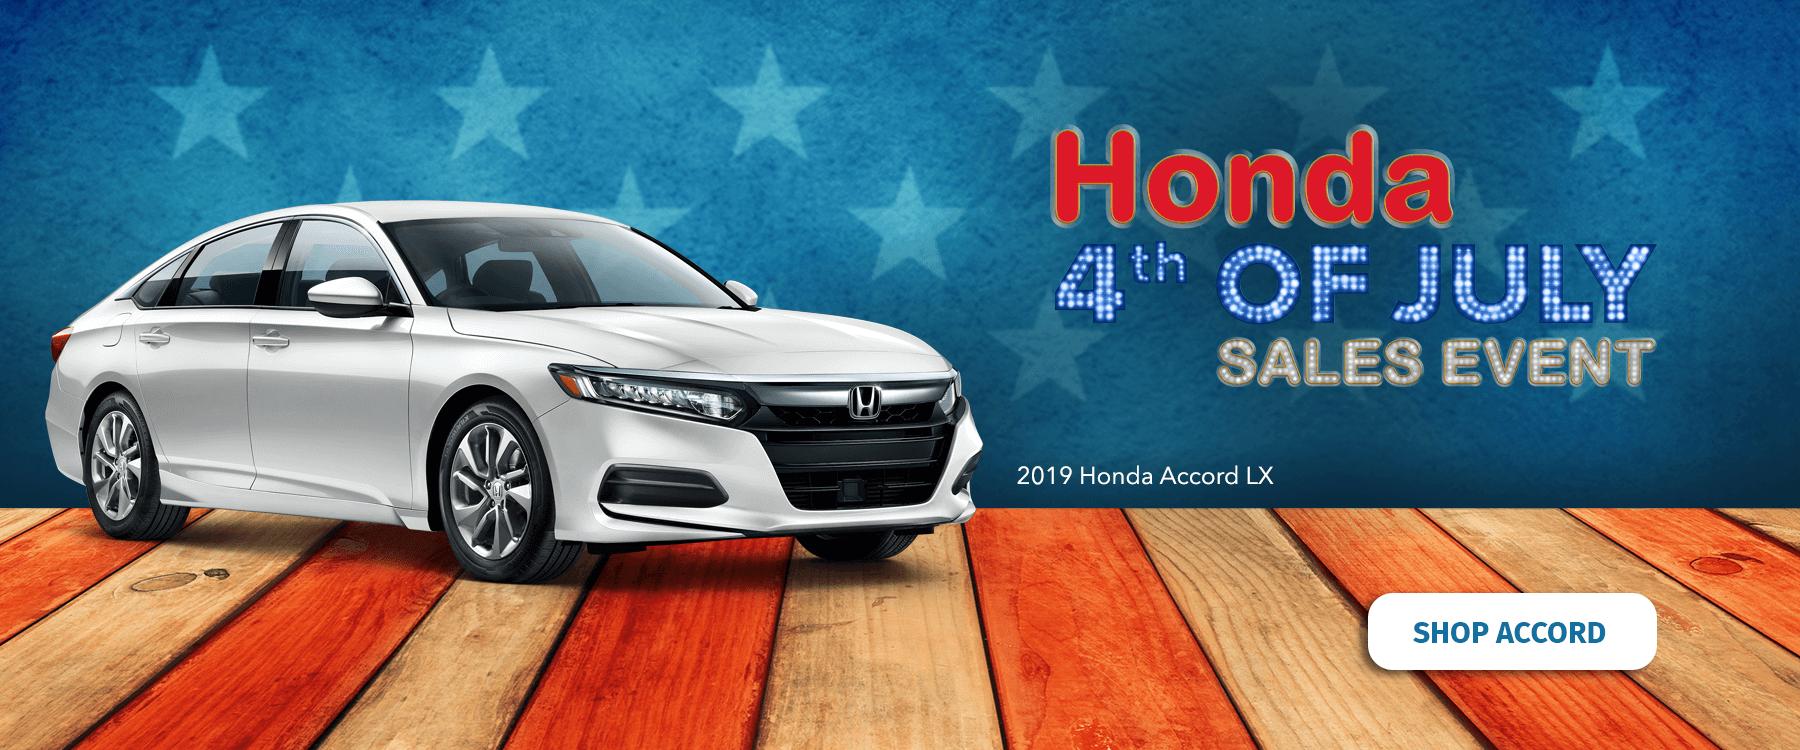 Honda 4th Of July Sales Event Summer Car Deals North Country Honda Dealers